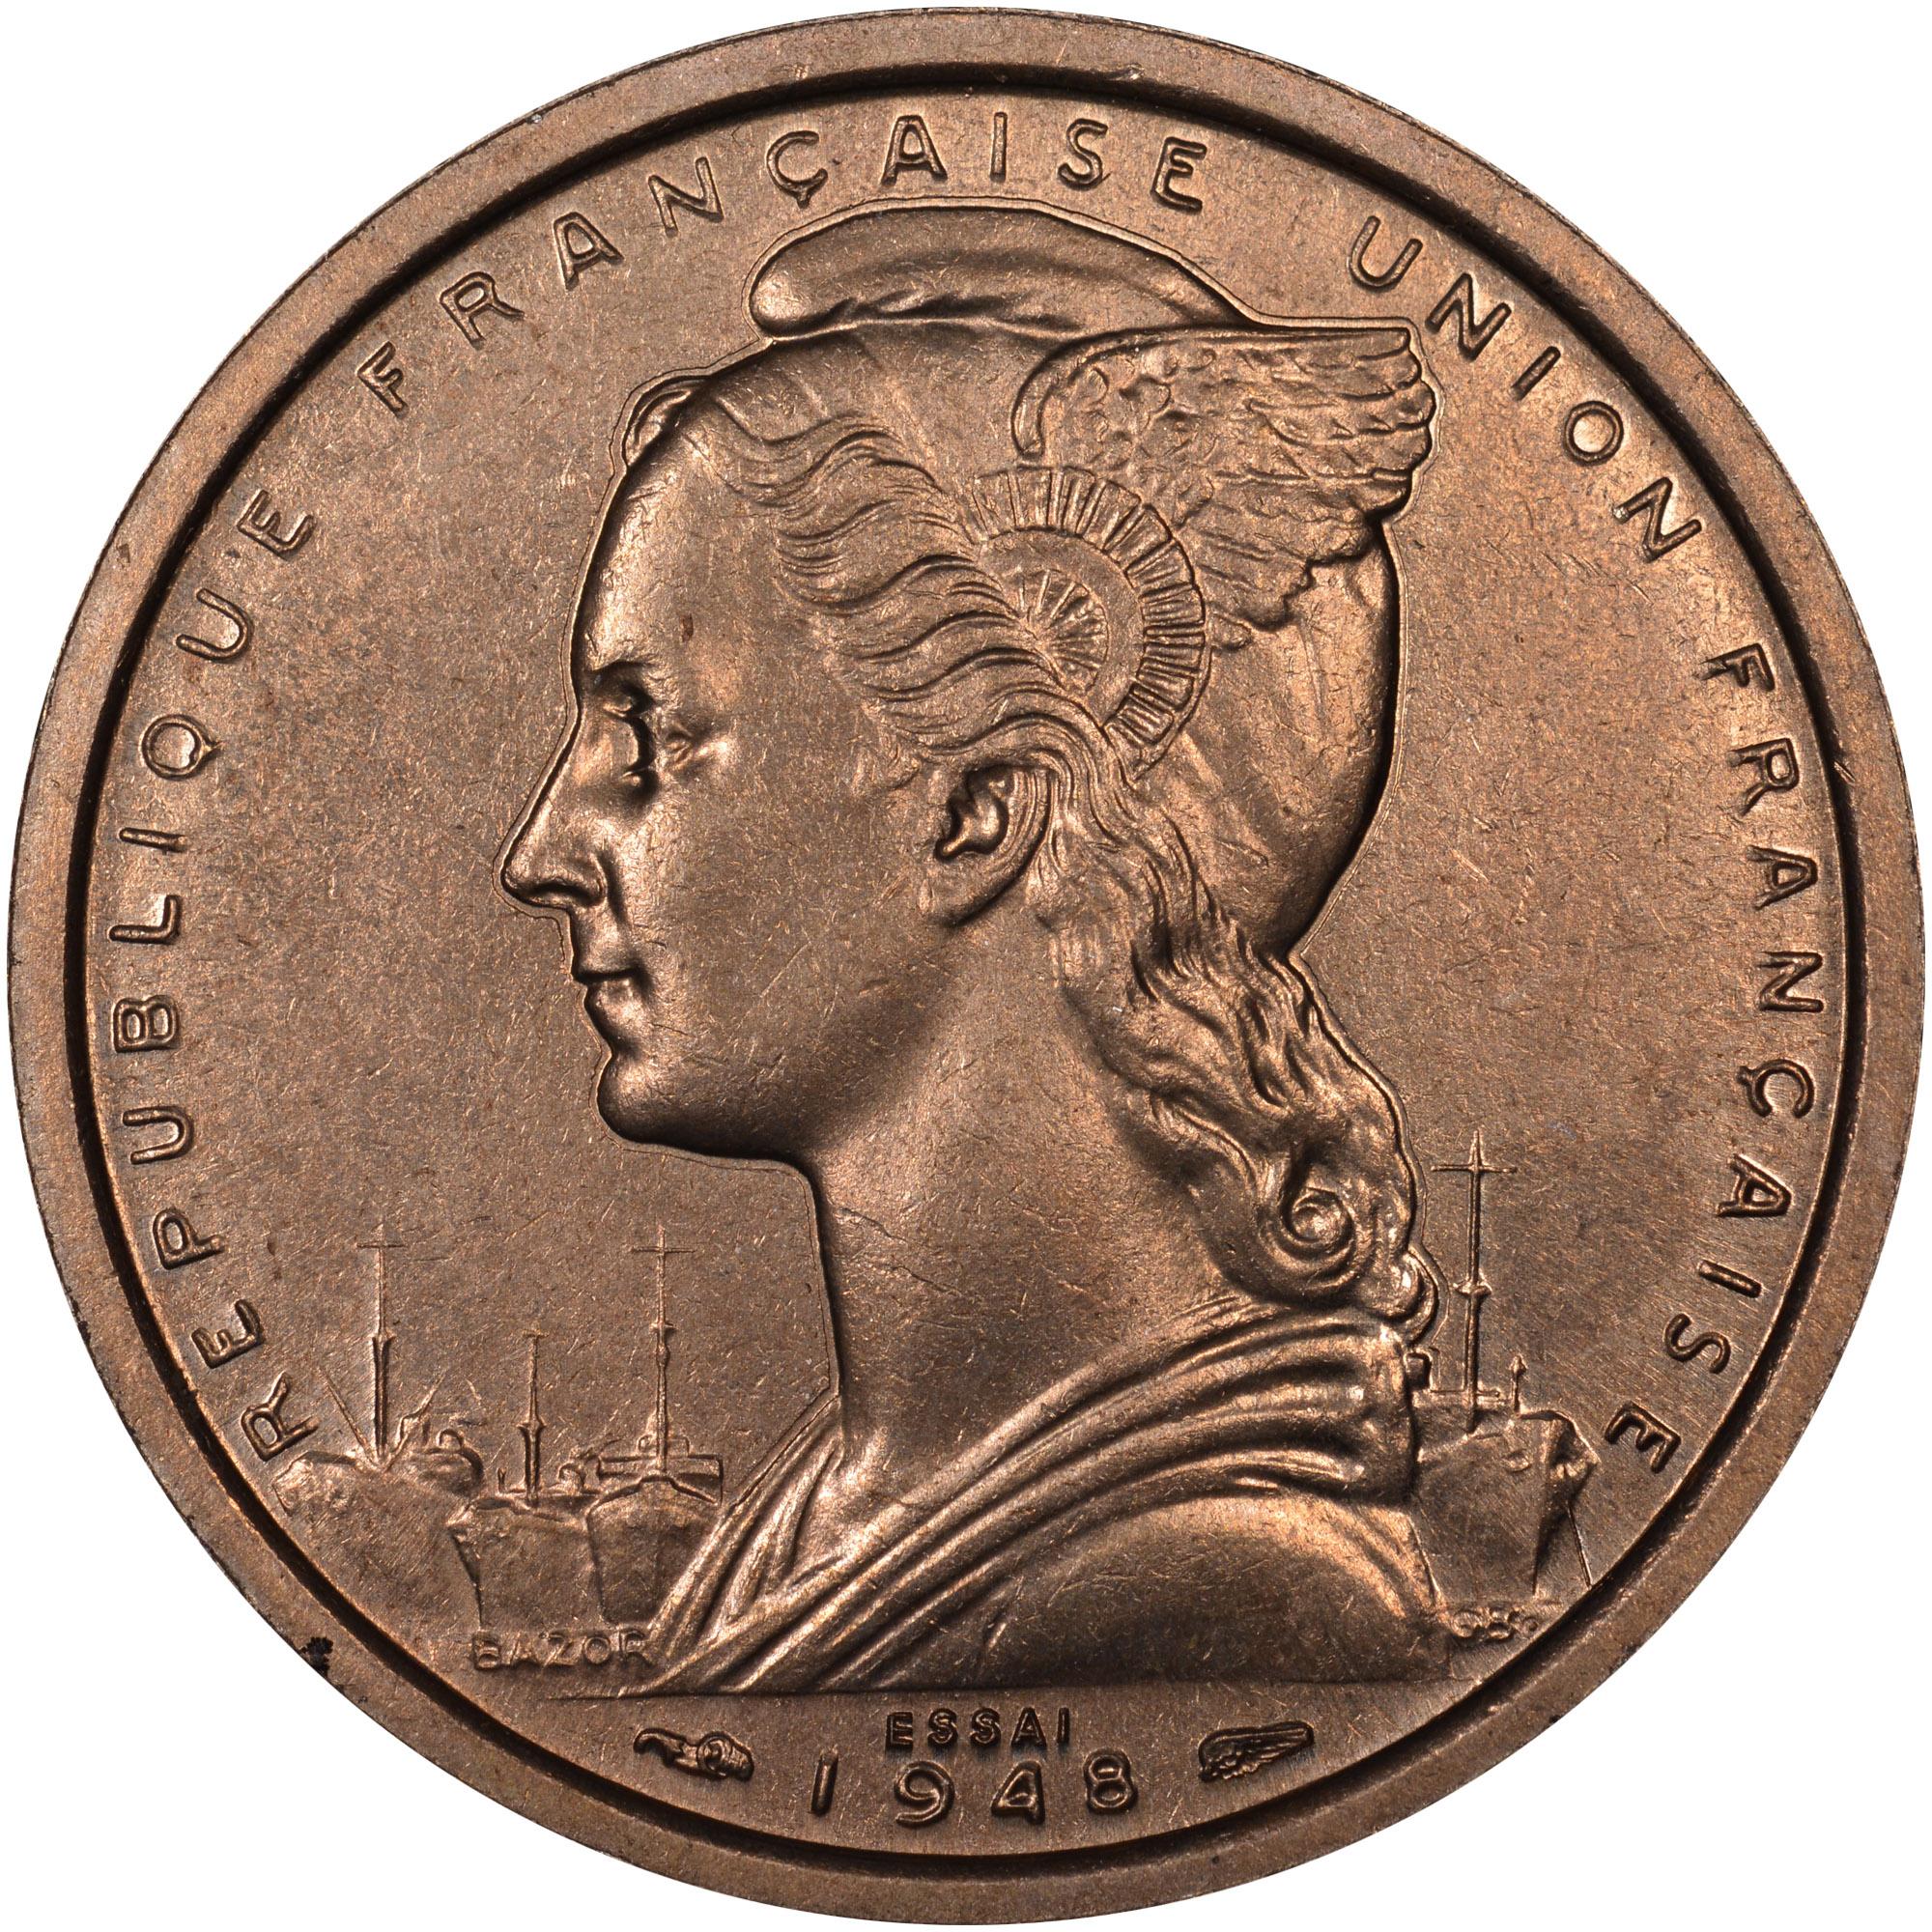 1948 Cameroon 2 Francs obverse